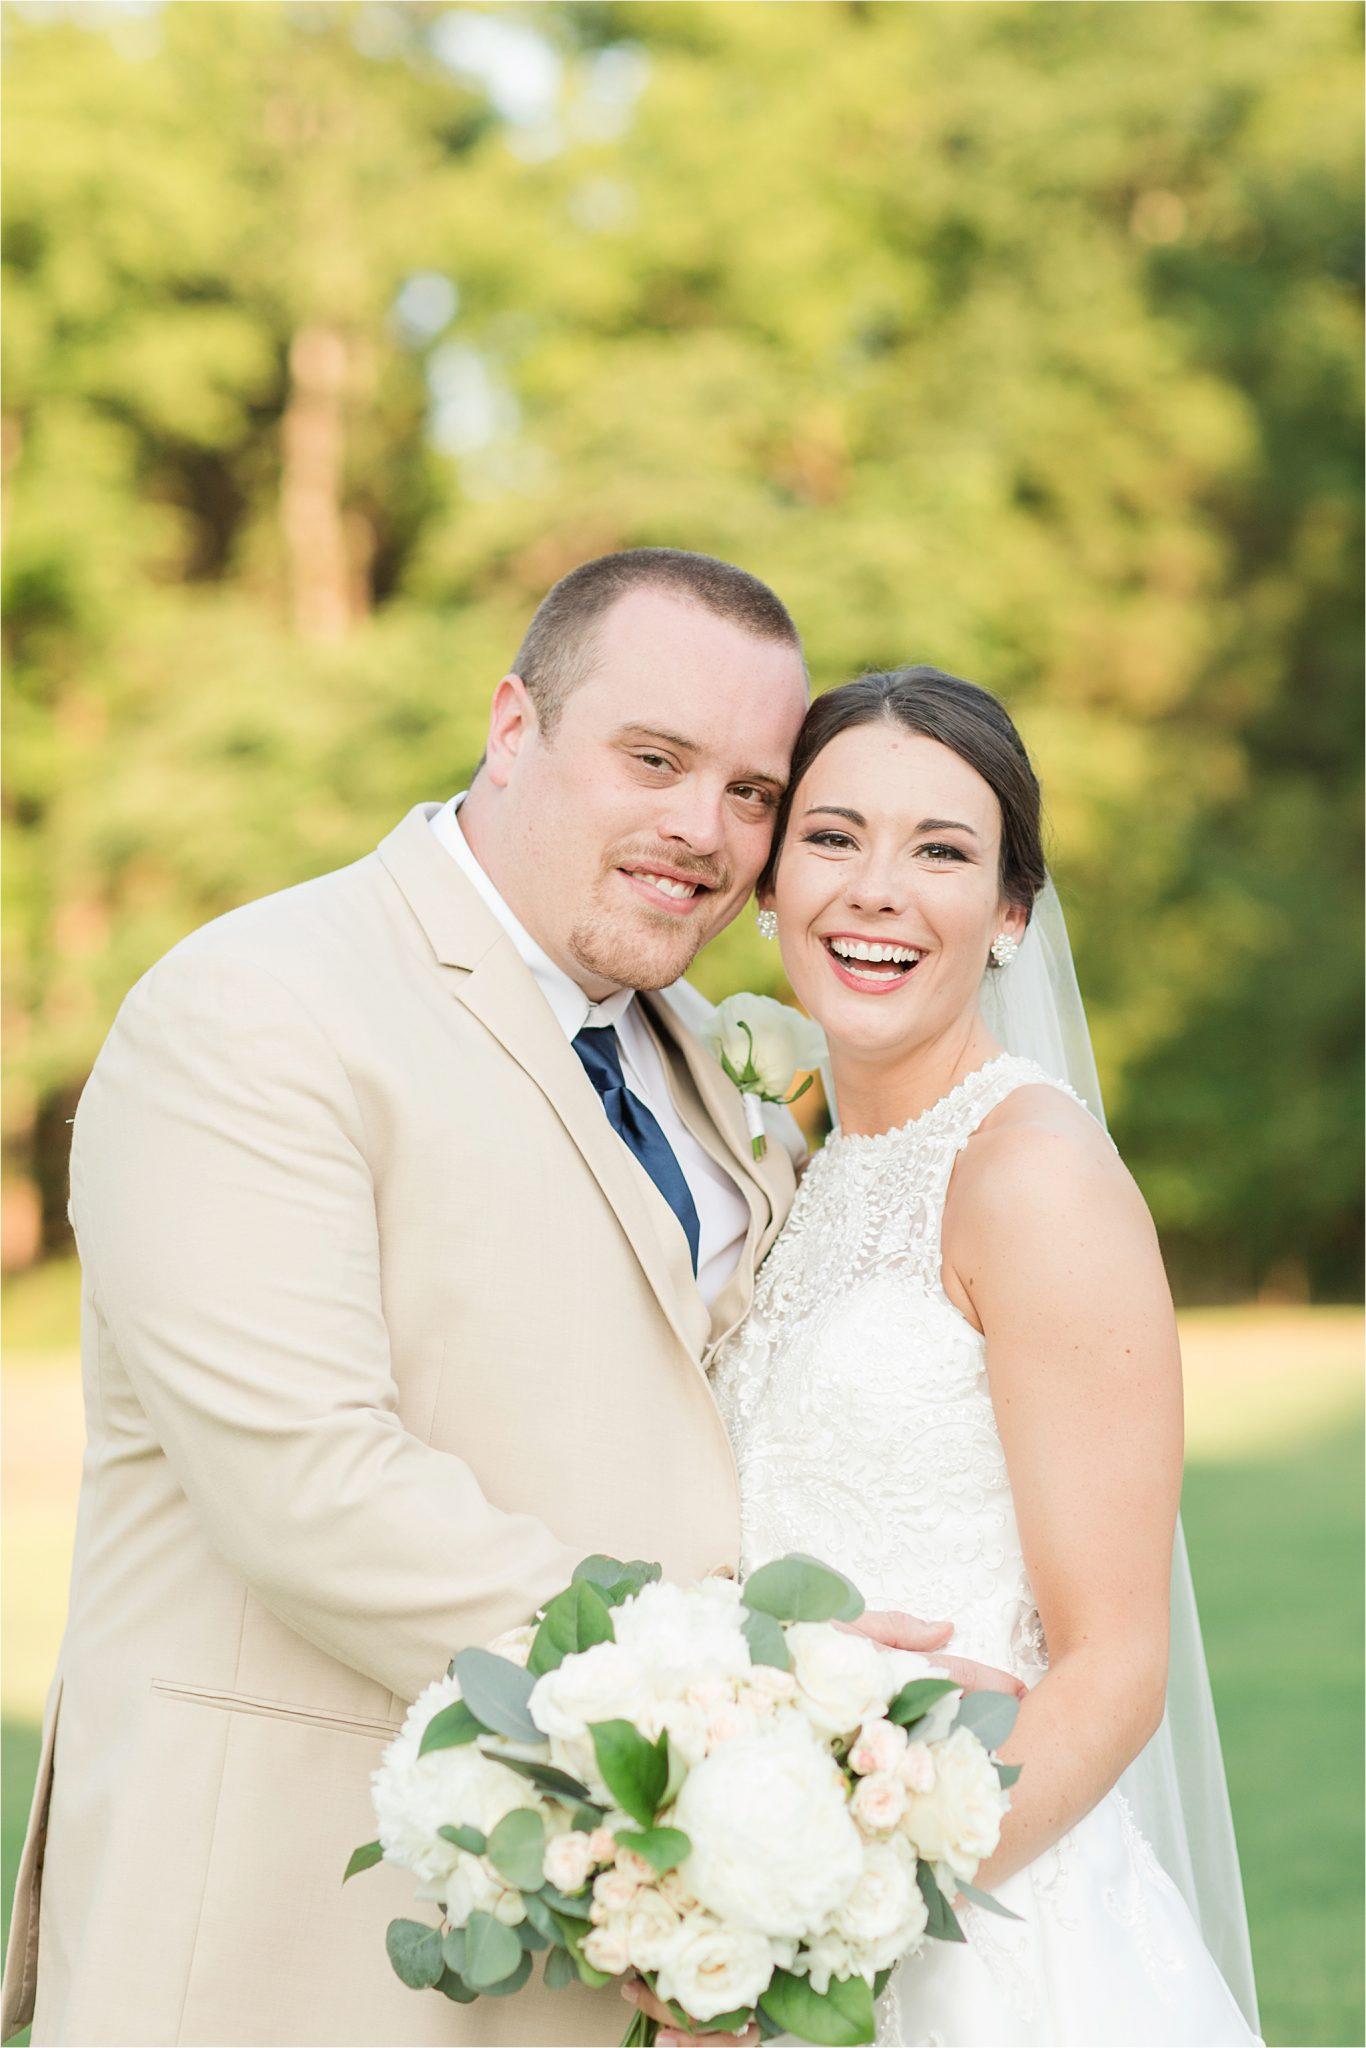 Sonnet House, Birmingham Alabama Wedding Photographer, Courtney + Ben